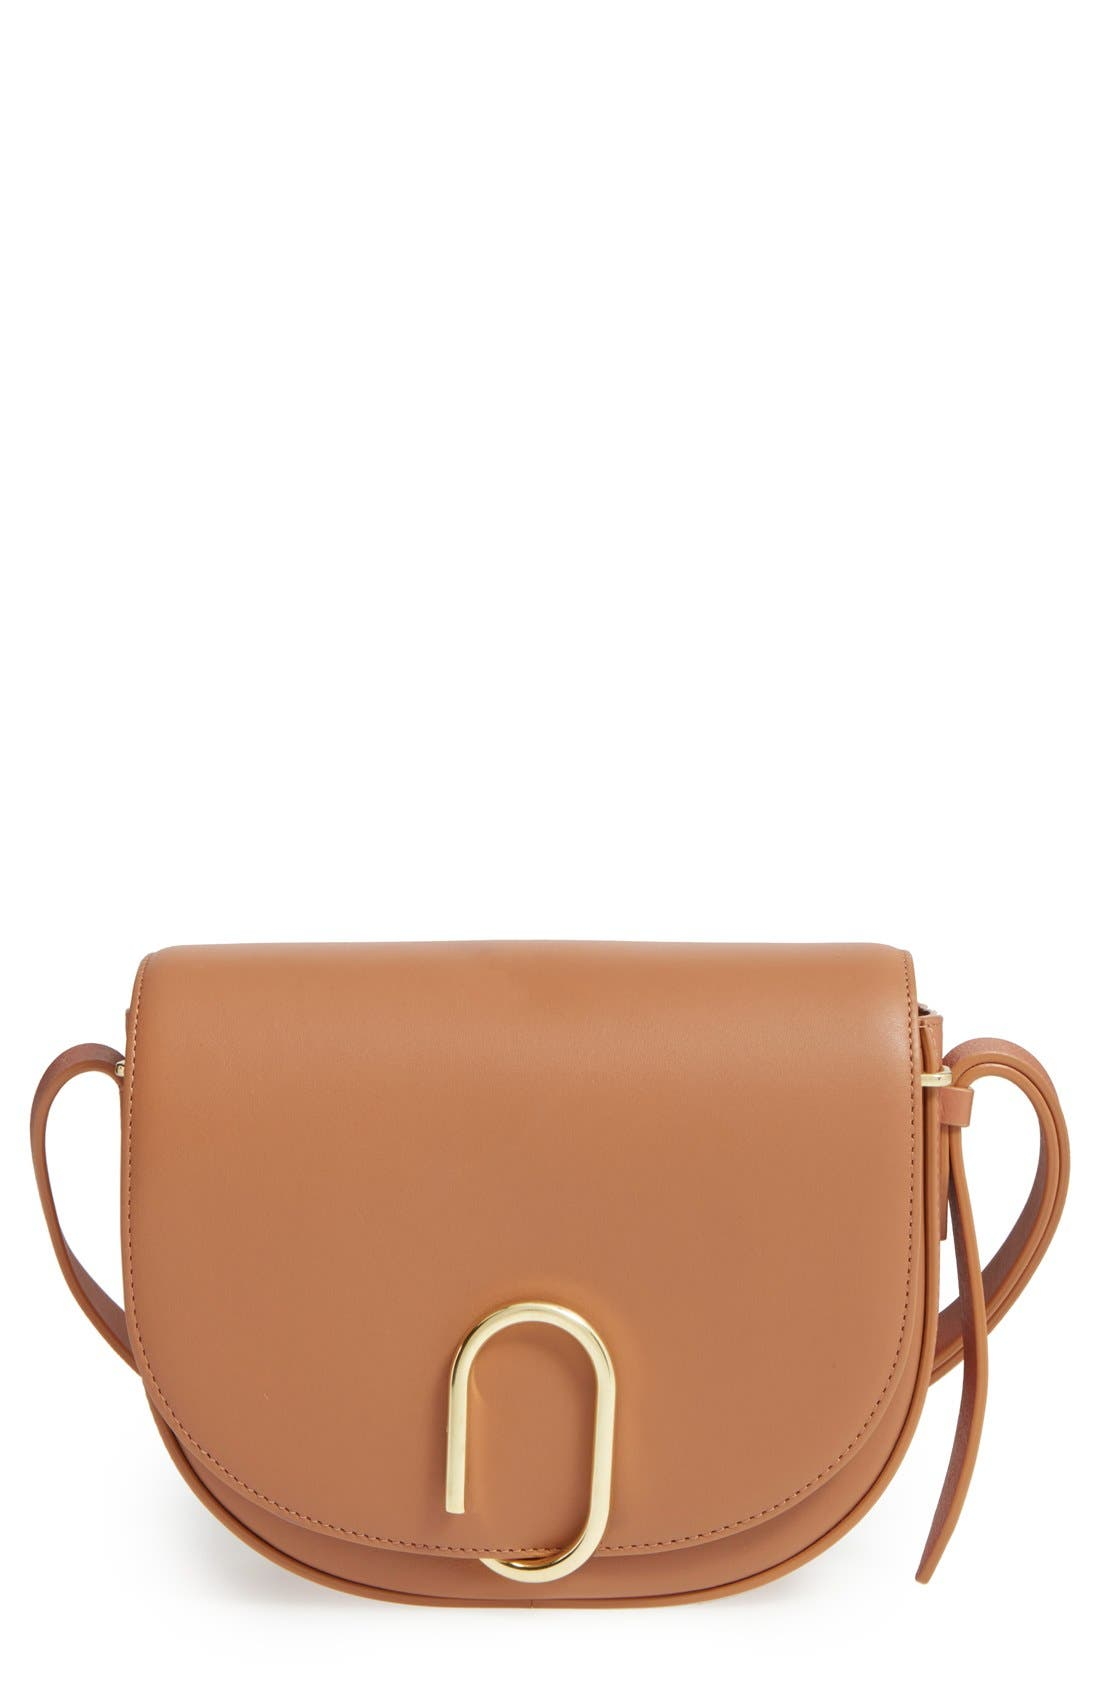 Alix Leather Saddle Bag,                             Main thumbnail 2, color,